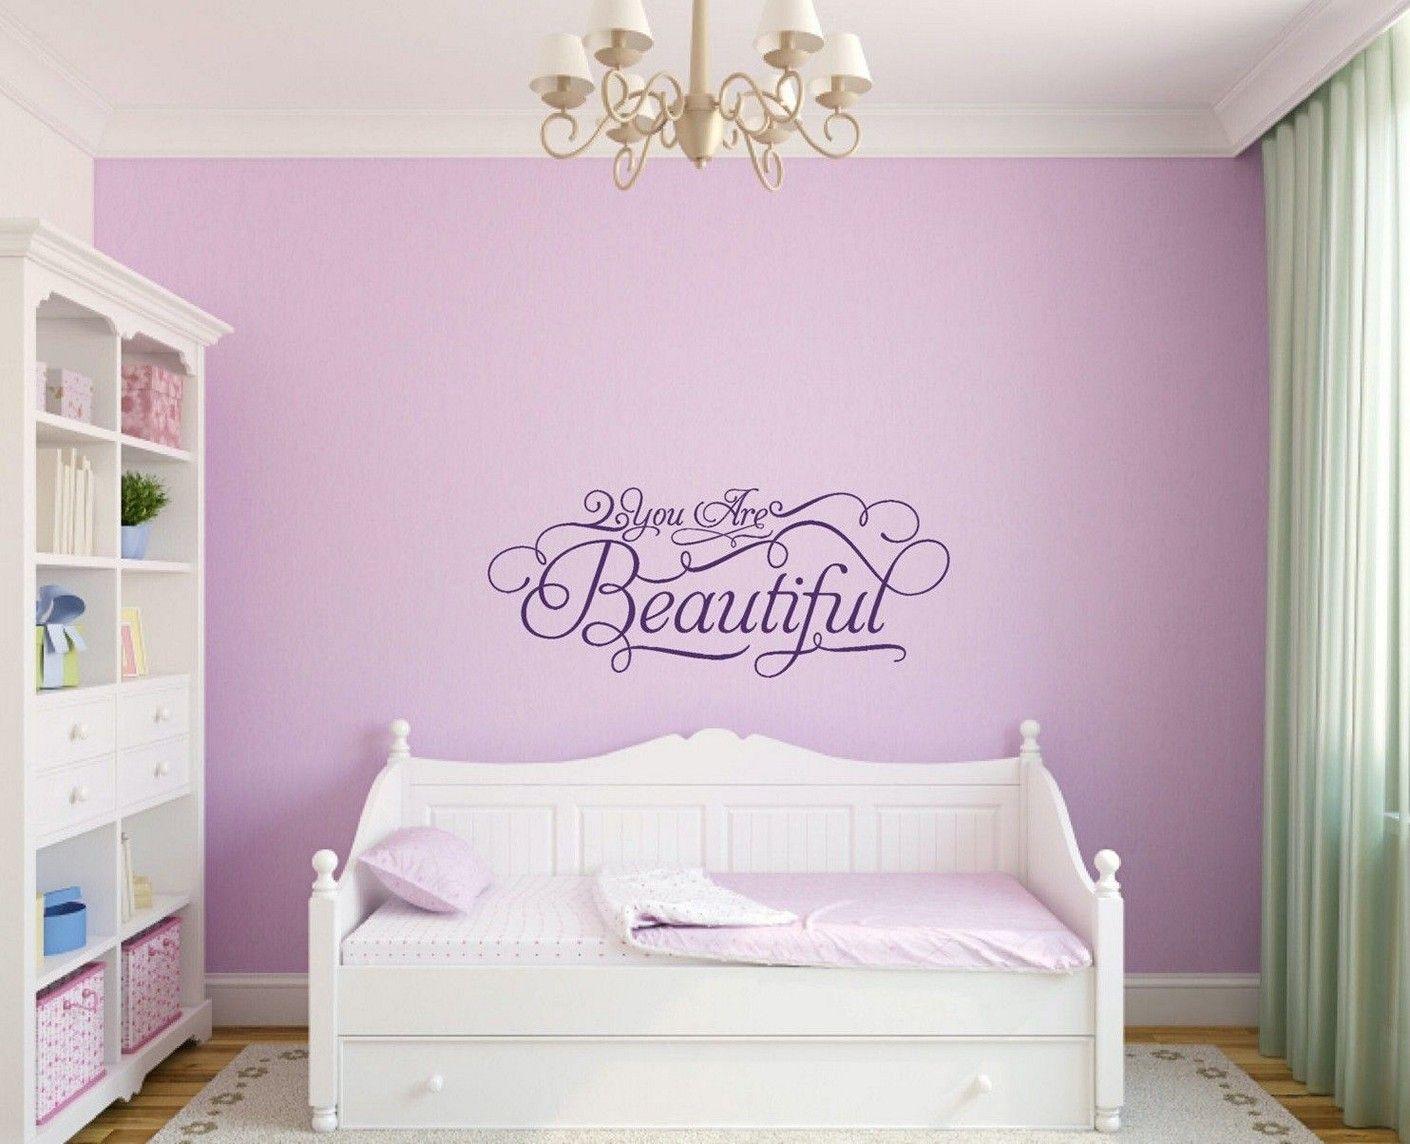 Bedroom wall stickers for teenage girls - Teenage Girl Bedroom Wall Art